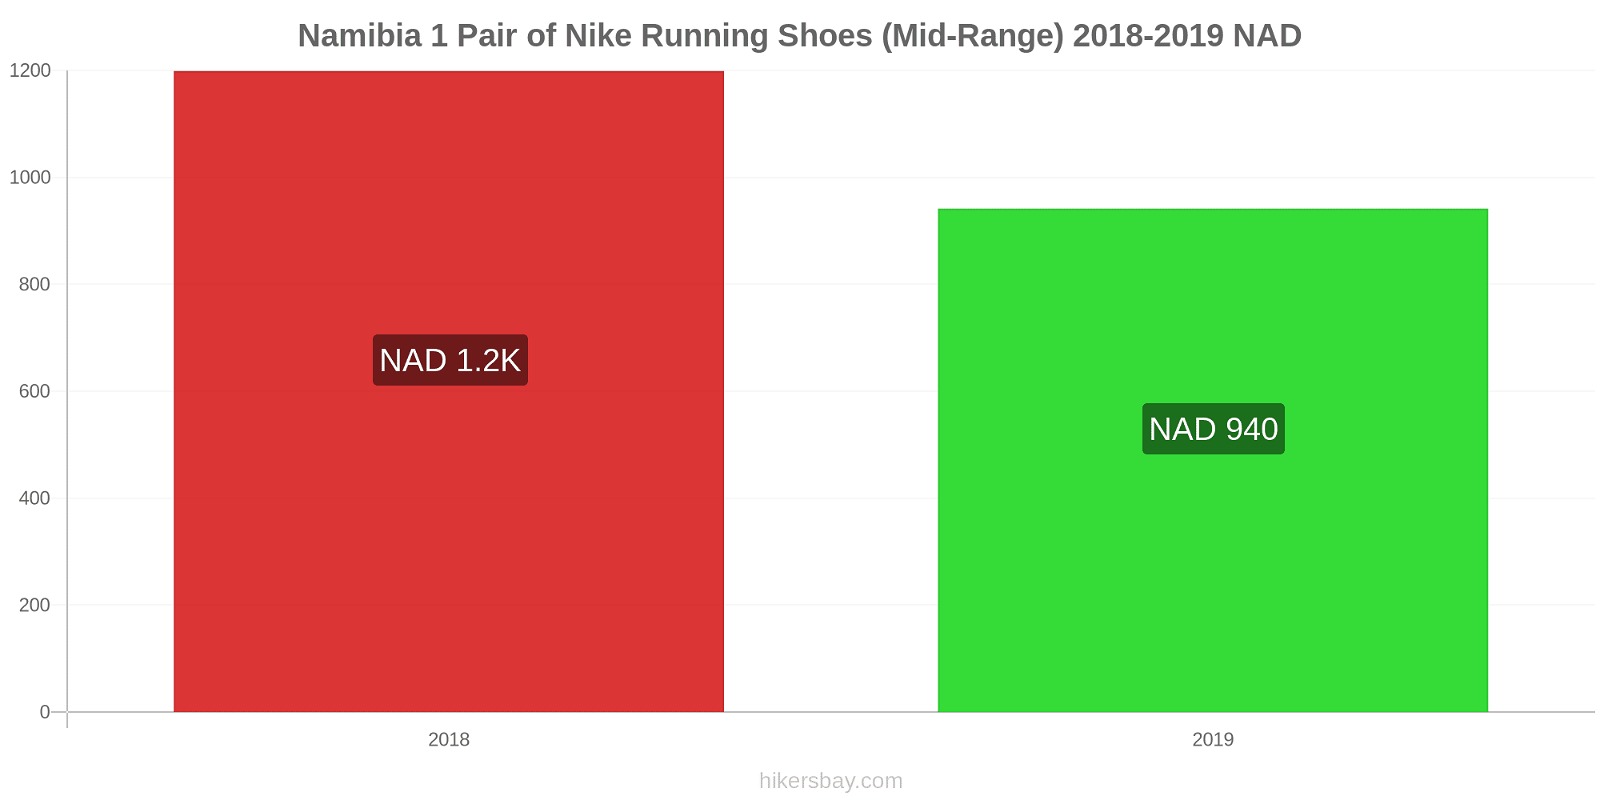 Namibia price changes 1 Pair of Nike Running Shoes (Mid-Range) hikersbay.com